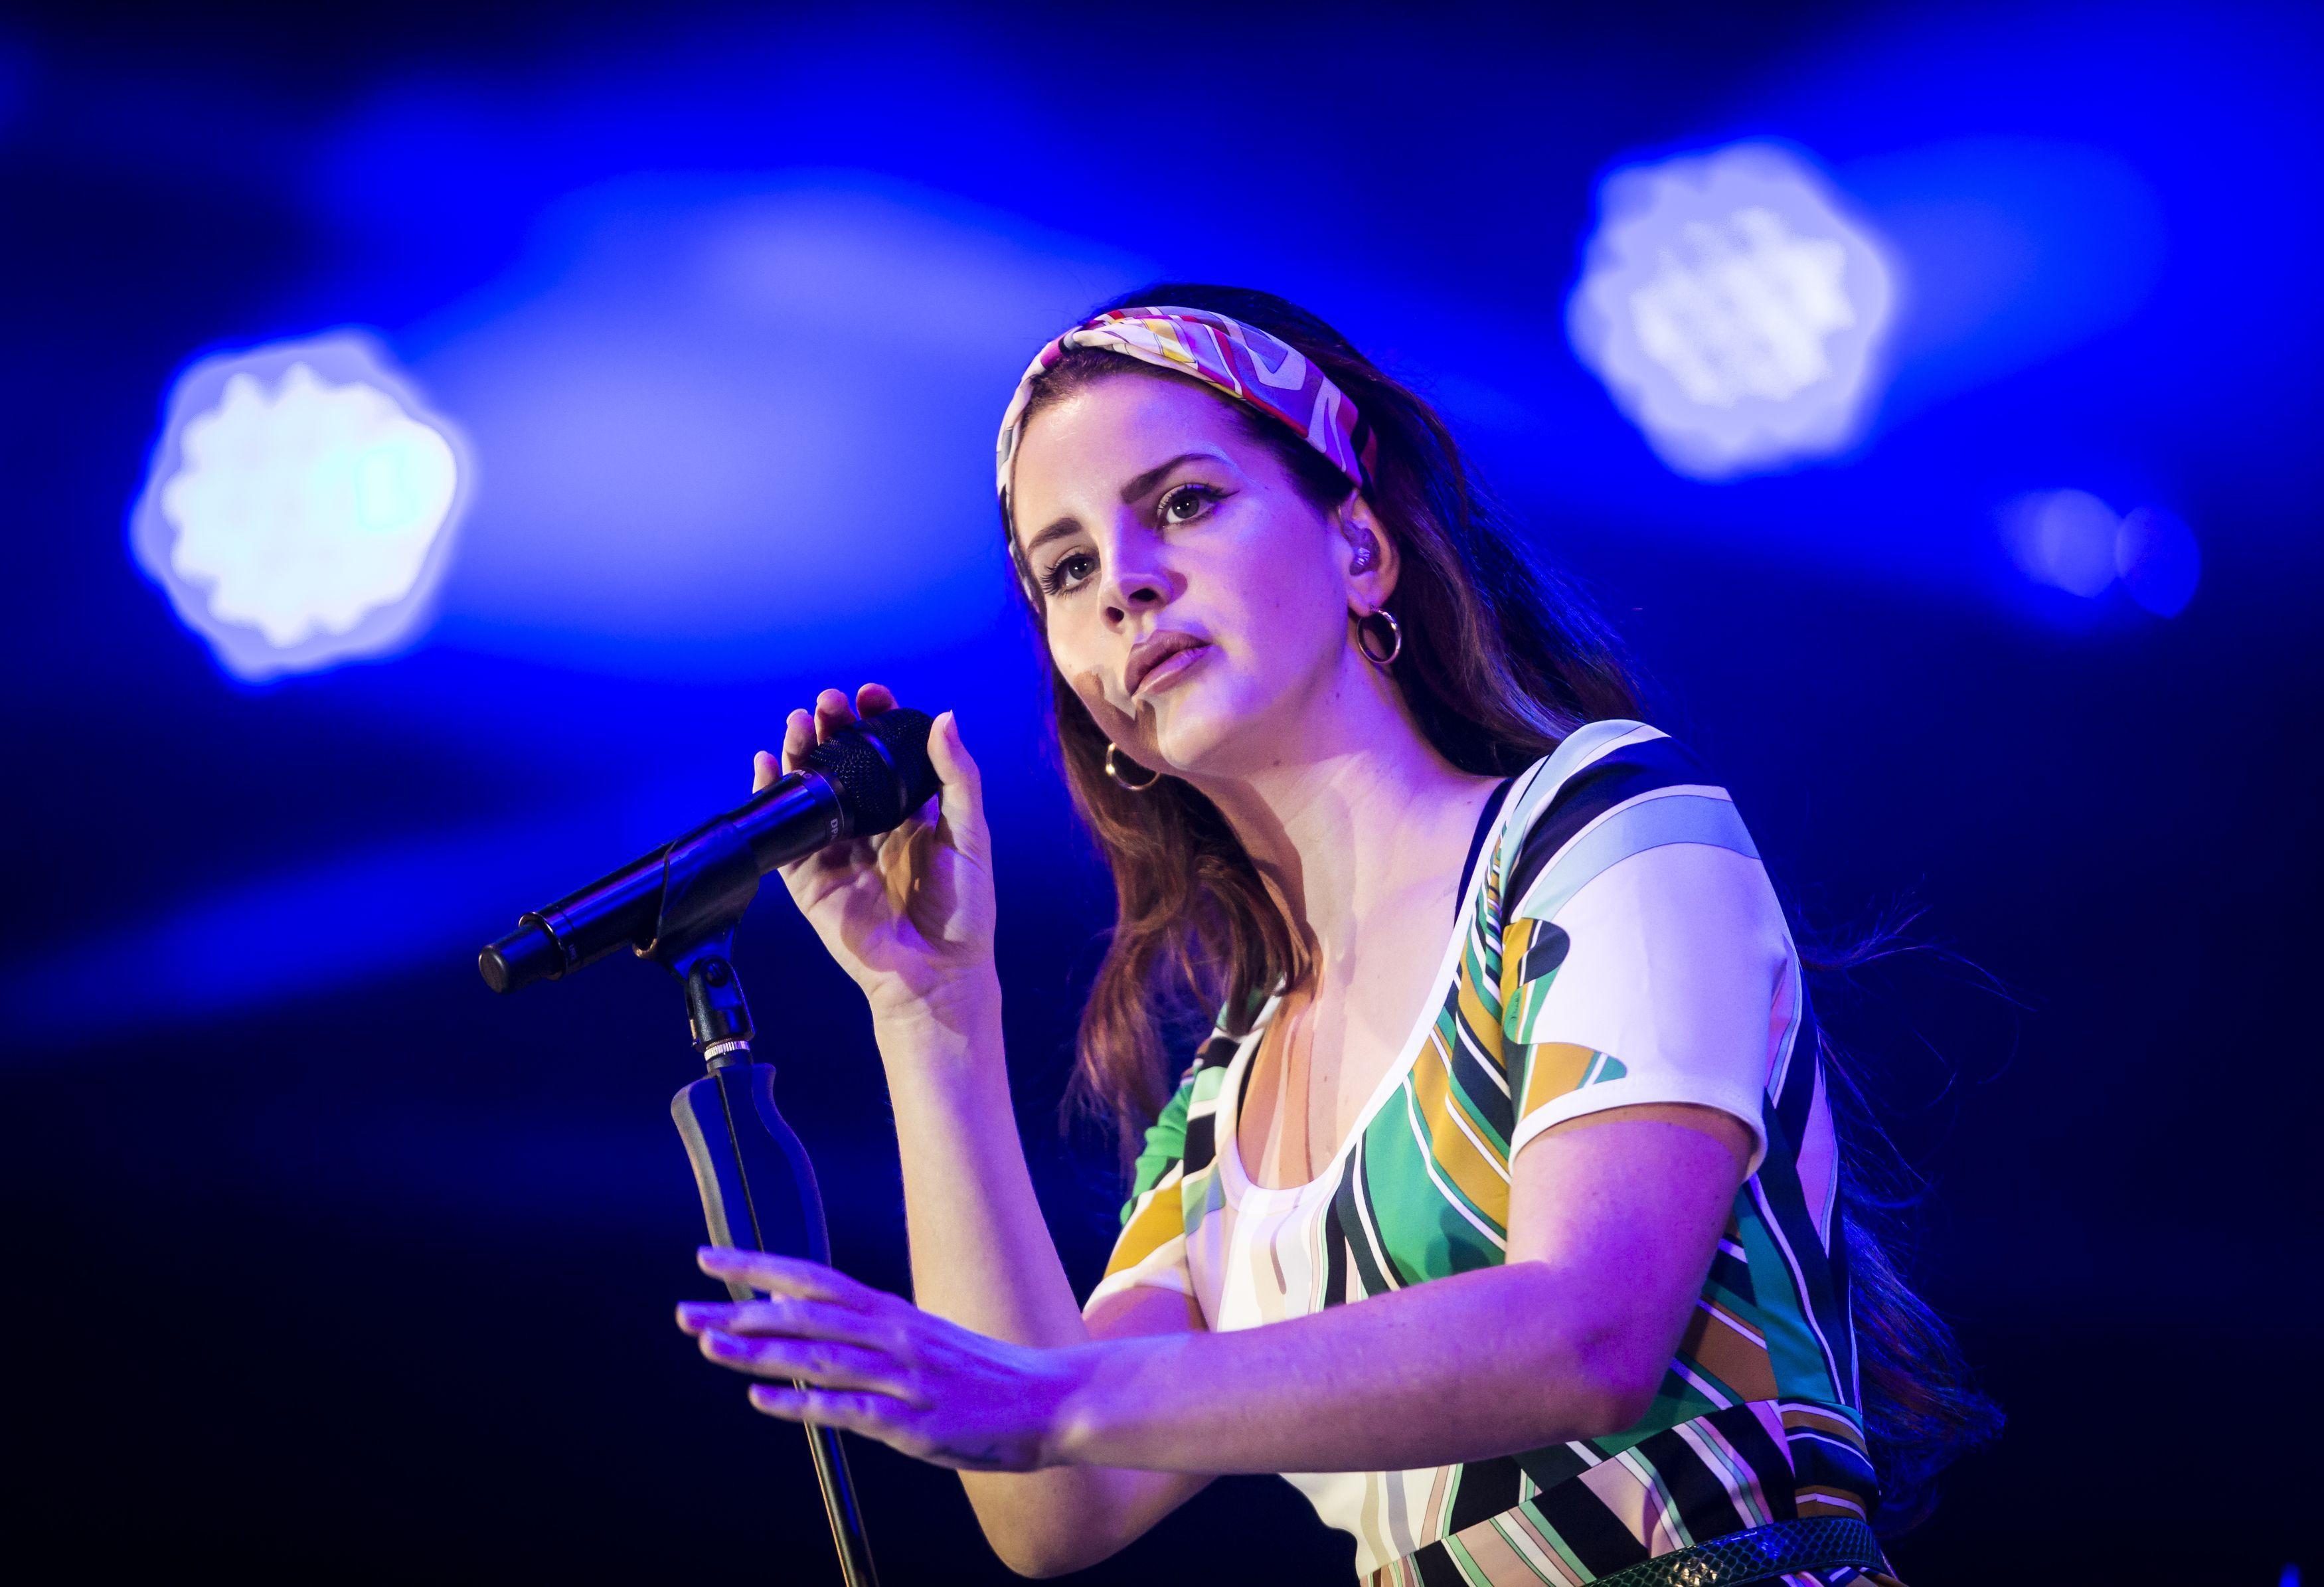 Lana Del Rey Announces New Album 'Blue Banisters' – Rolling Stone